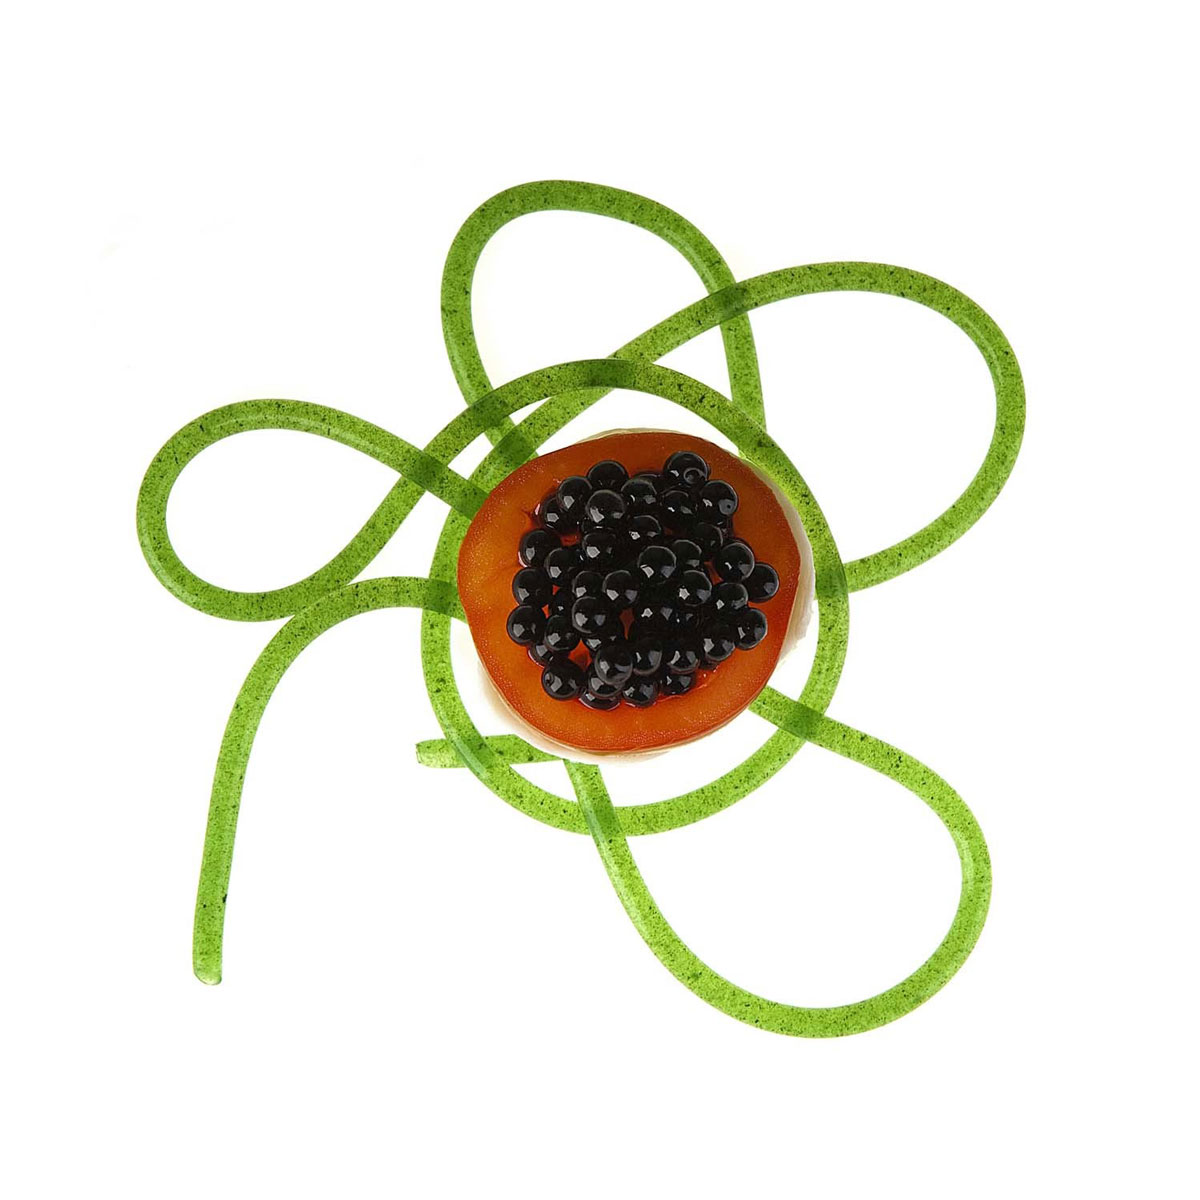 Cuisine R-Evolution - Molecular Gastronomy Kit - The Green Head